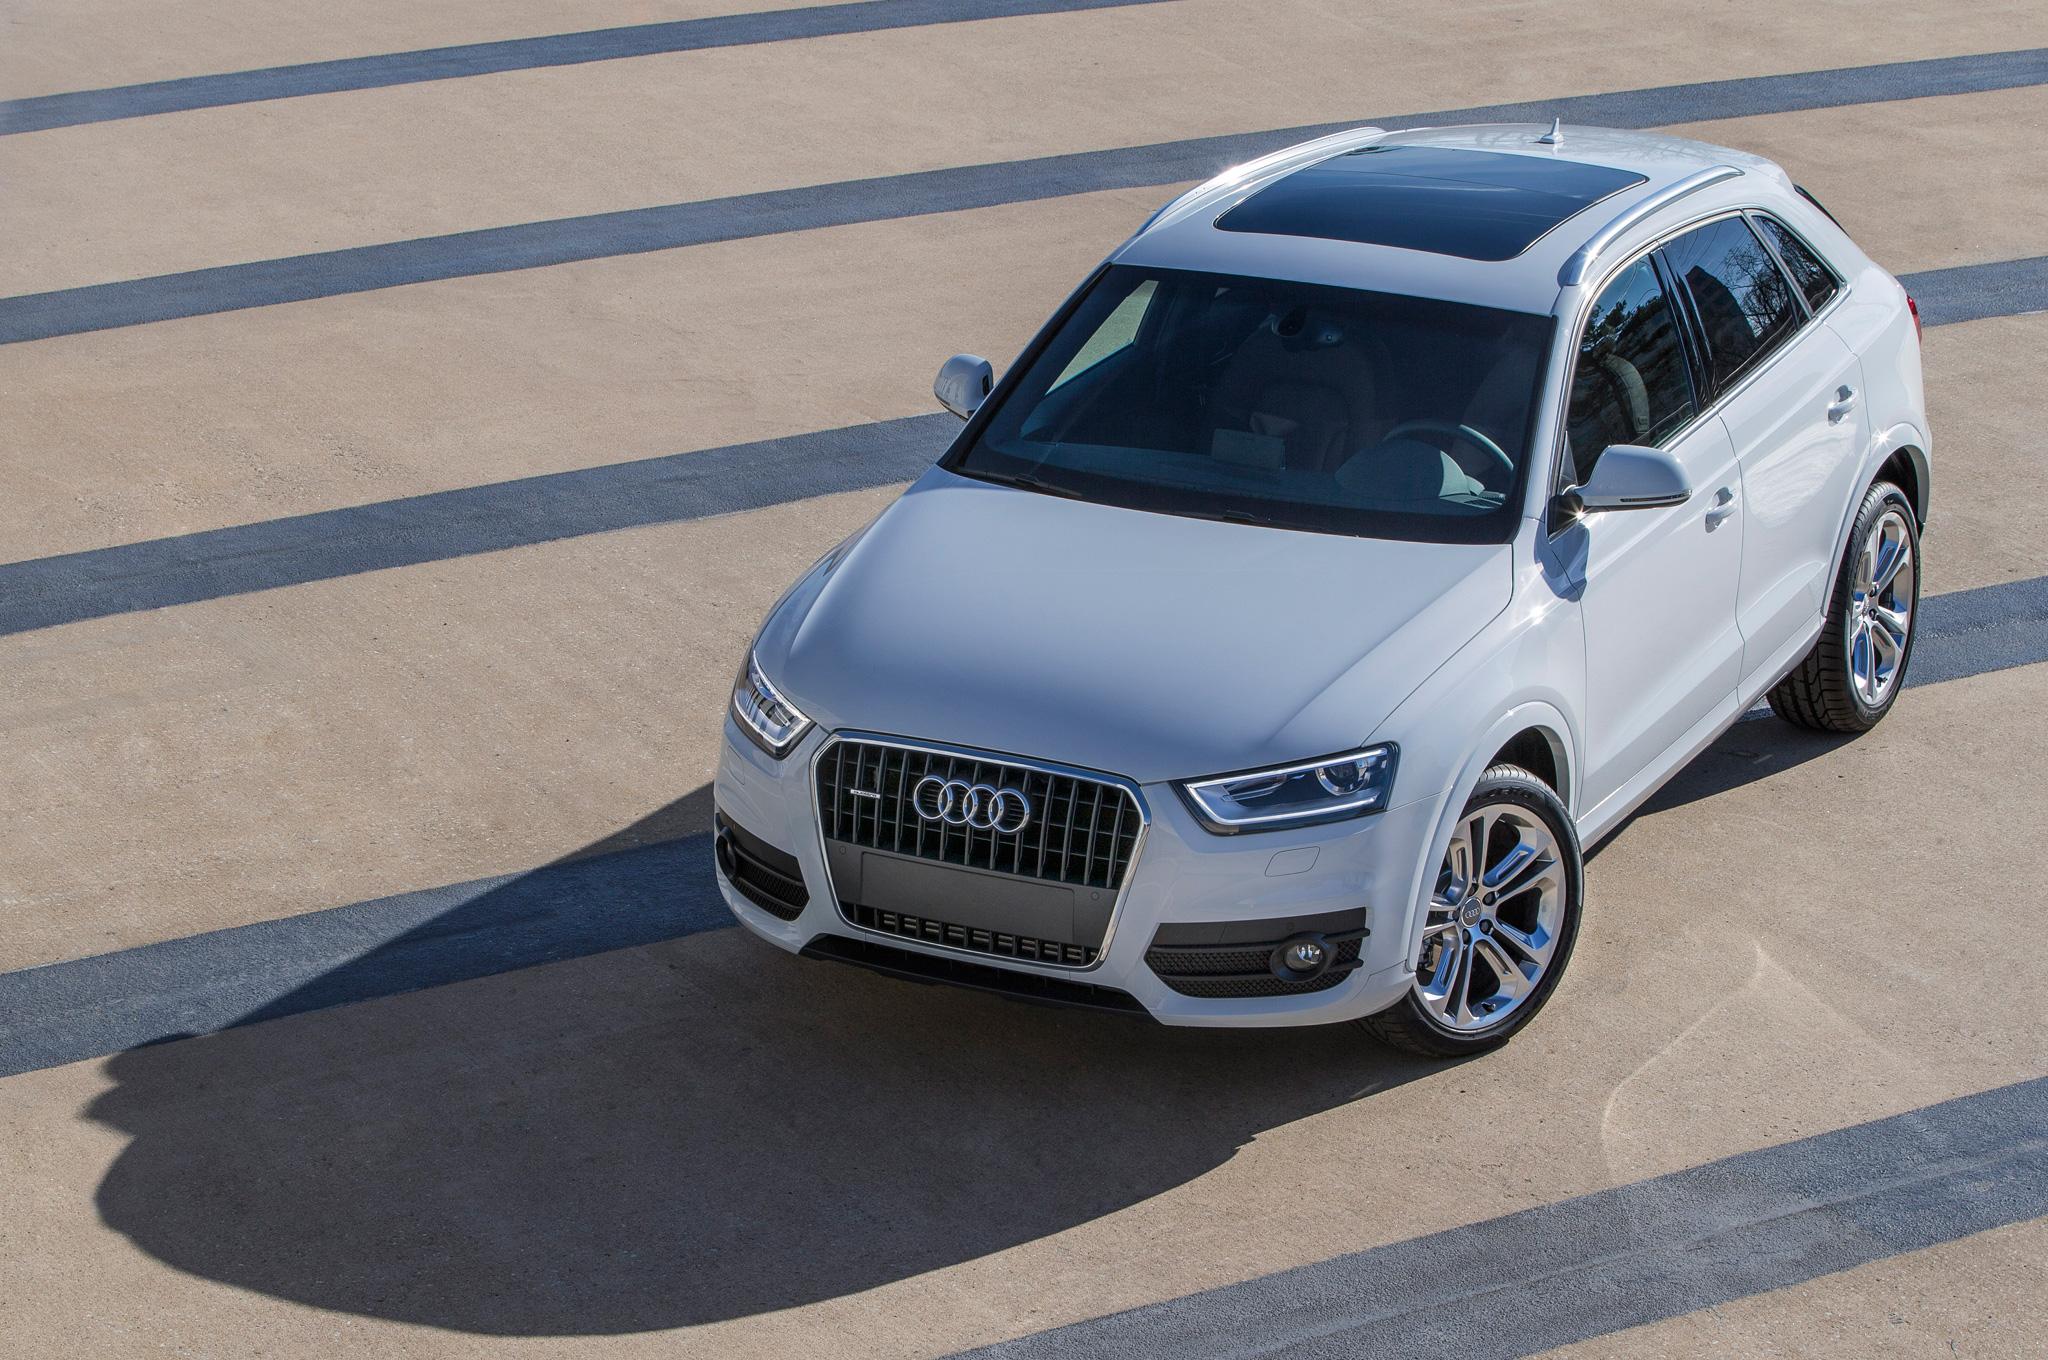 2015 Audi Q3 Above View